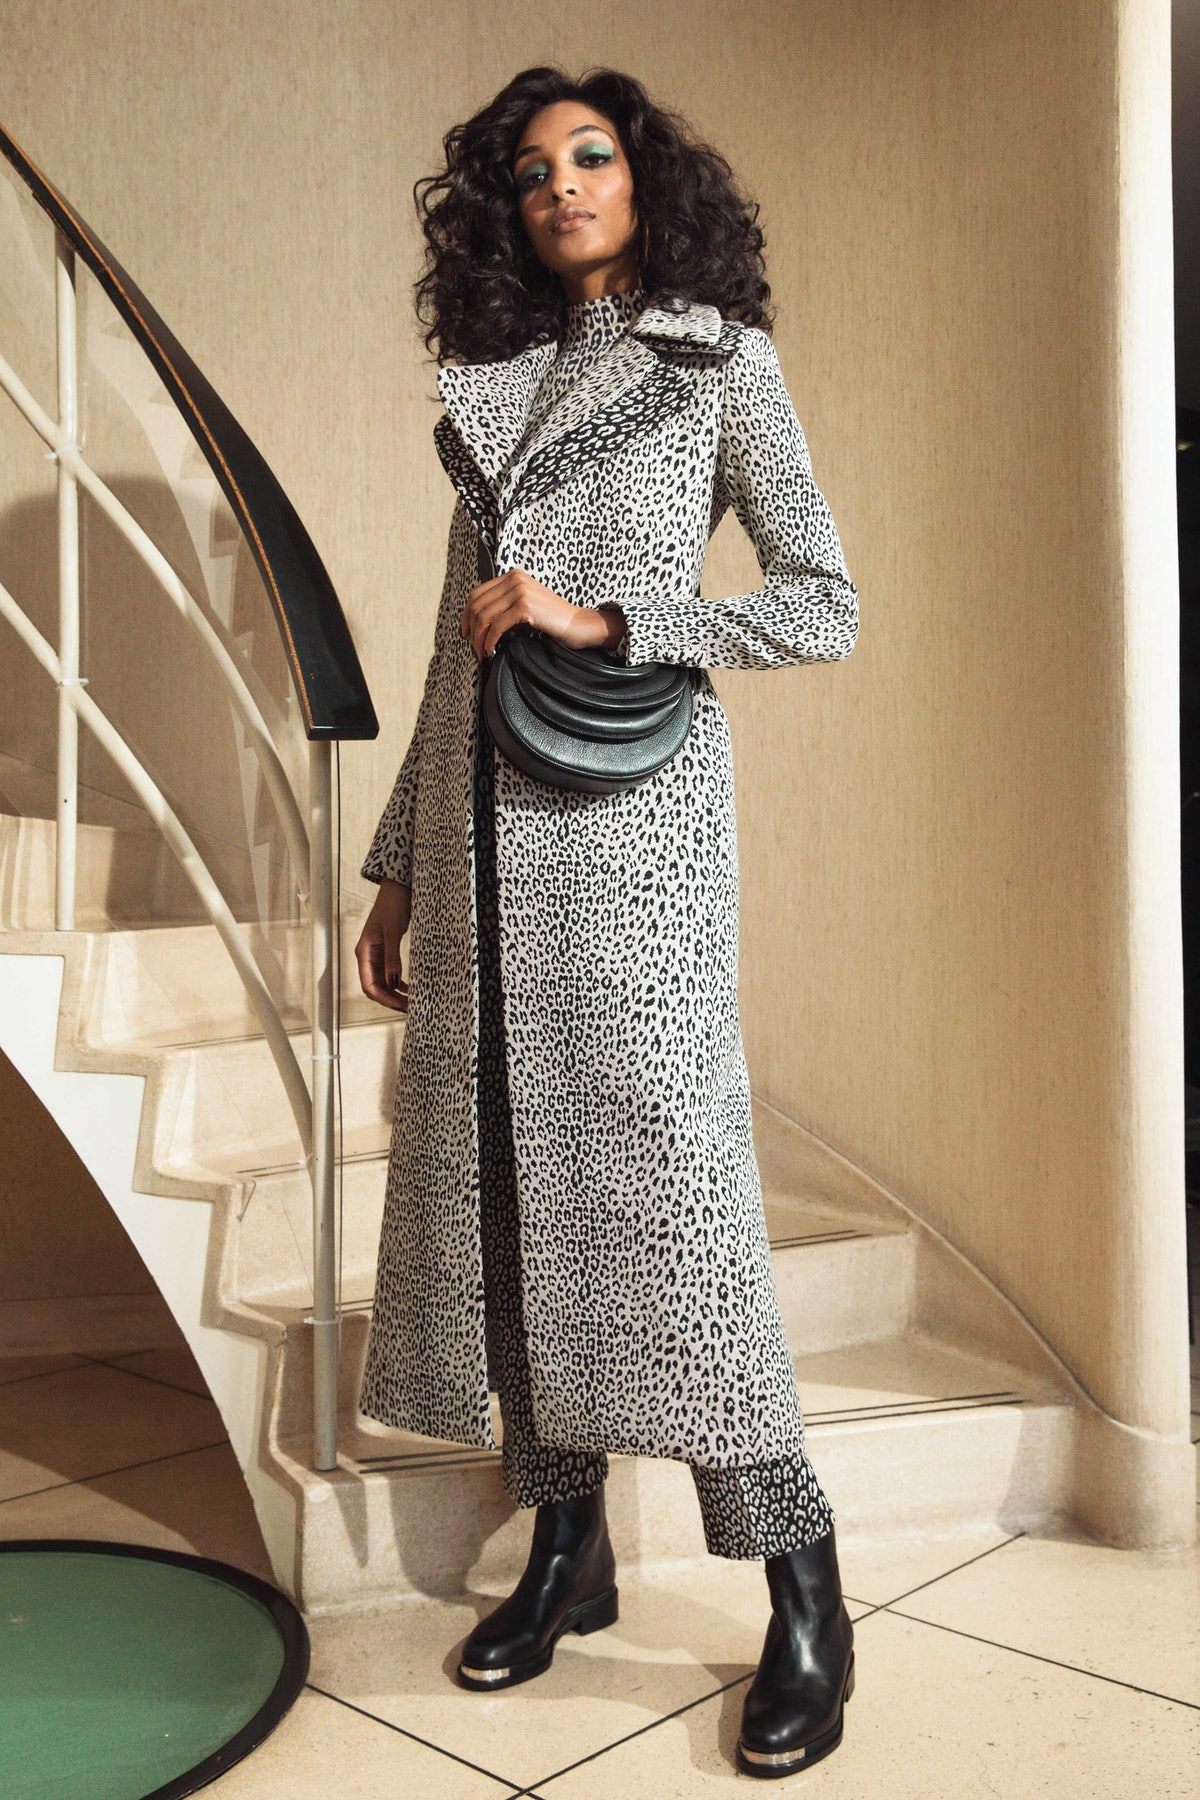 Jourdan Dunn in leopard print coat